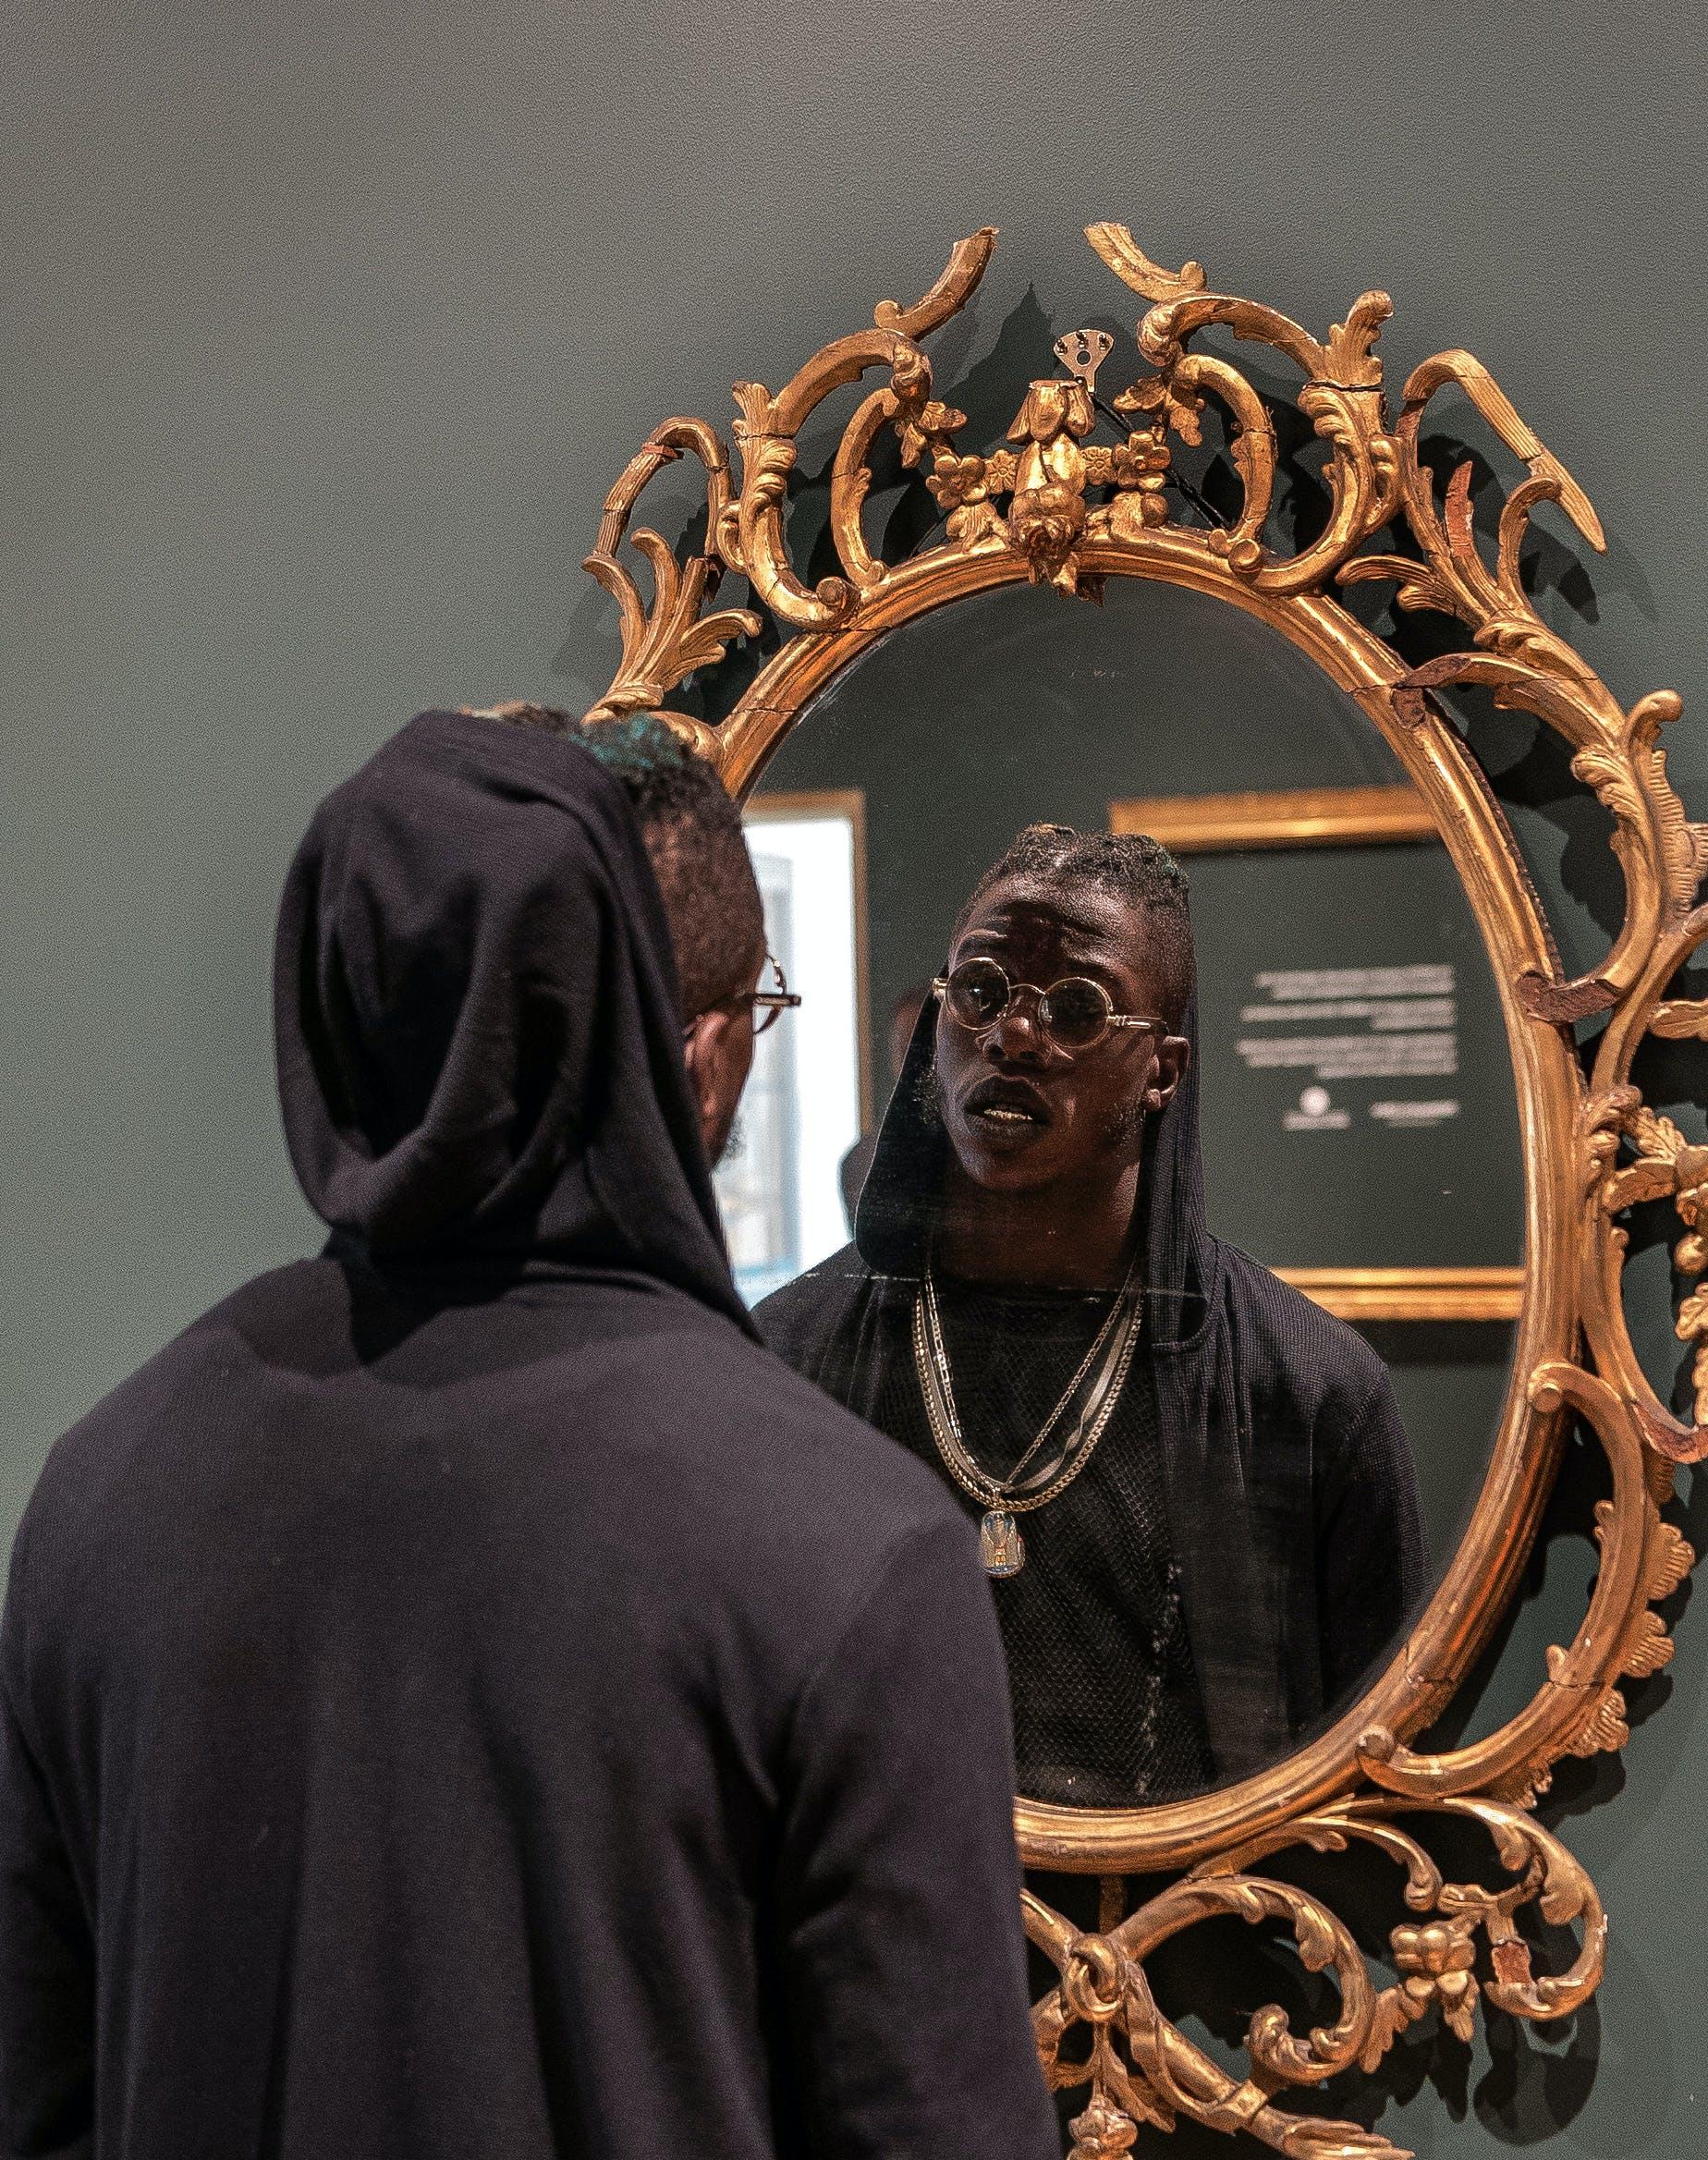 Man Facing Brown Framed Mirror